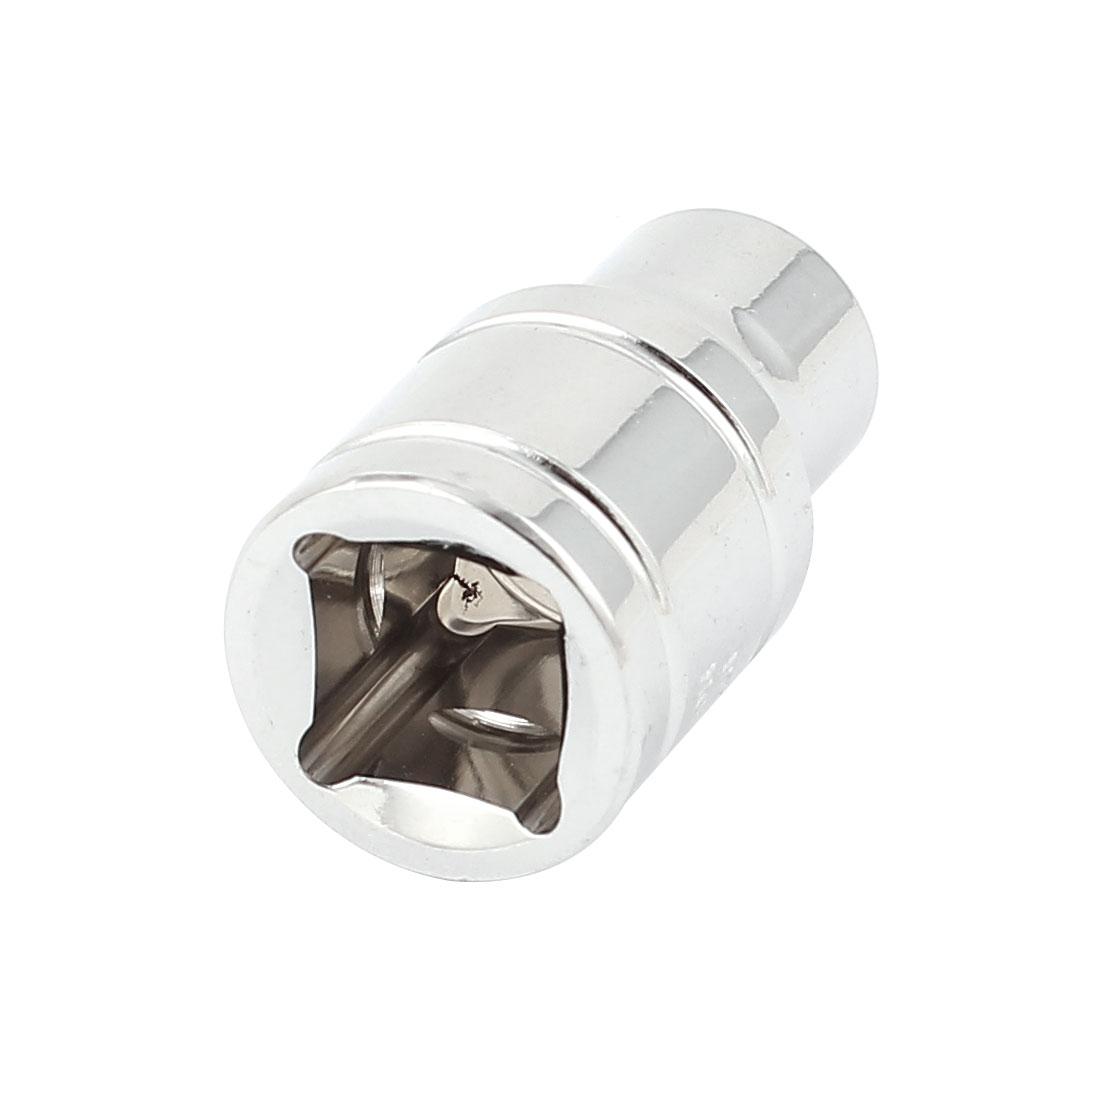 "3/8"" Drive Chrome-vanadium Steel Metric 6 Point Axle Nut Hex Socket 8mm"